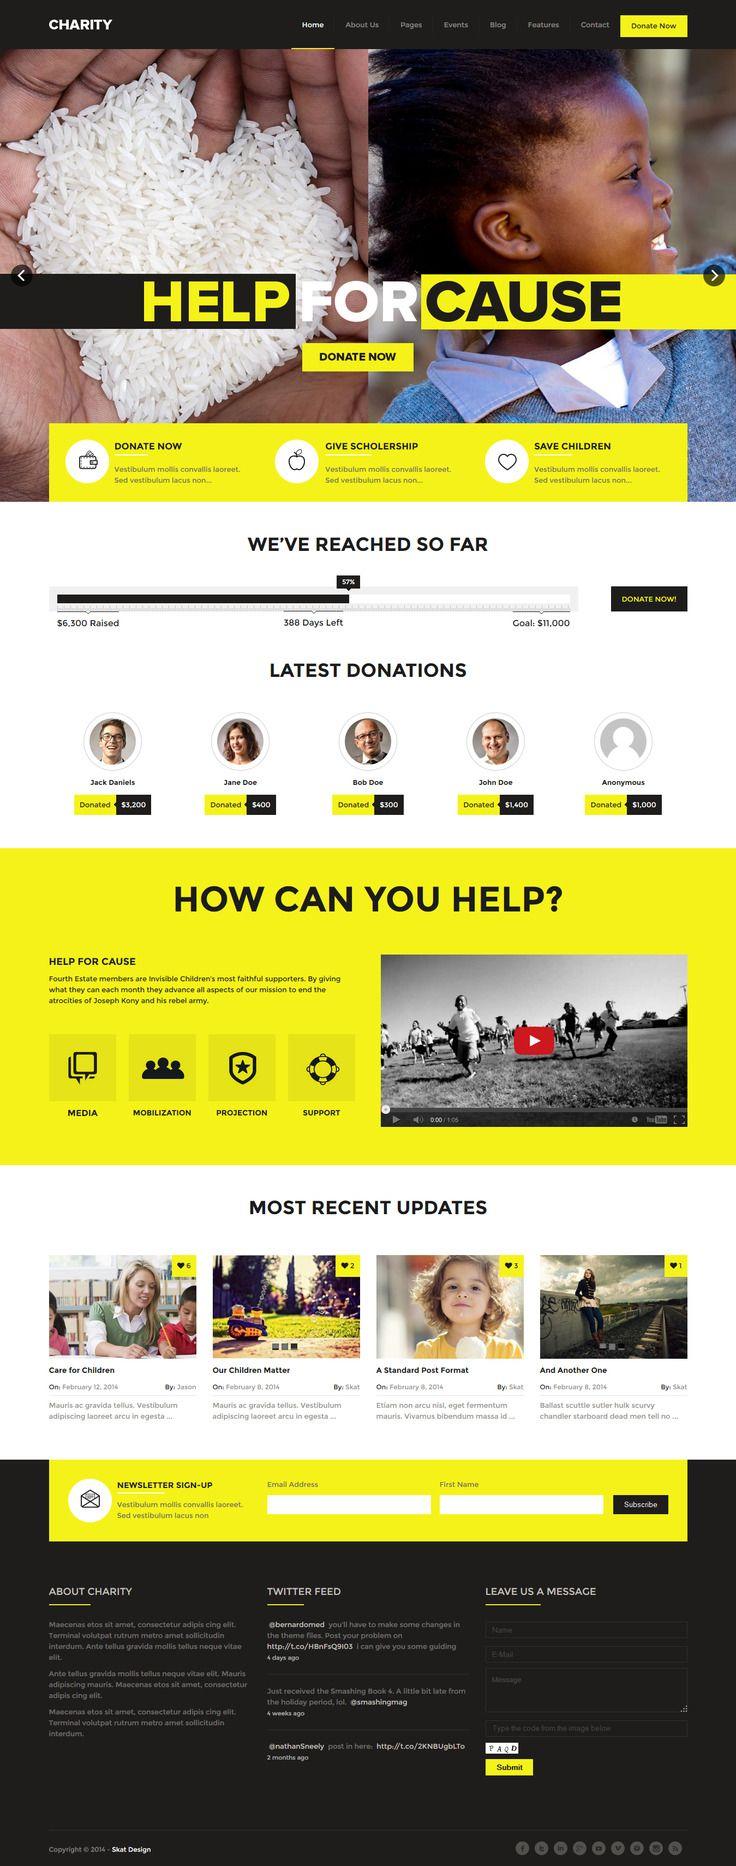 Charity Donations Foundation Fundraising premium WordPress theme, built on the Bootstrap Framework. #webdesign #wordpress